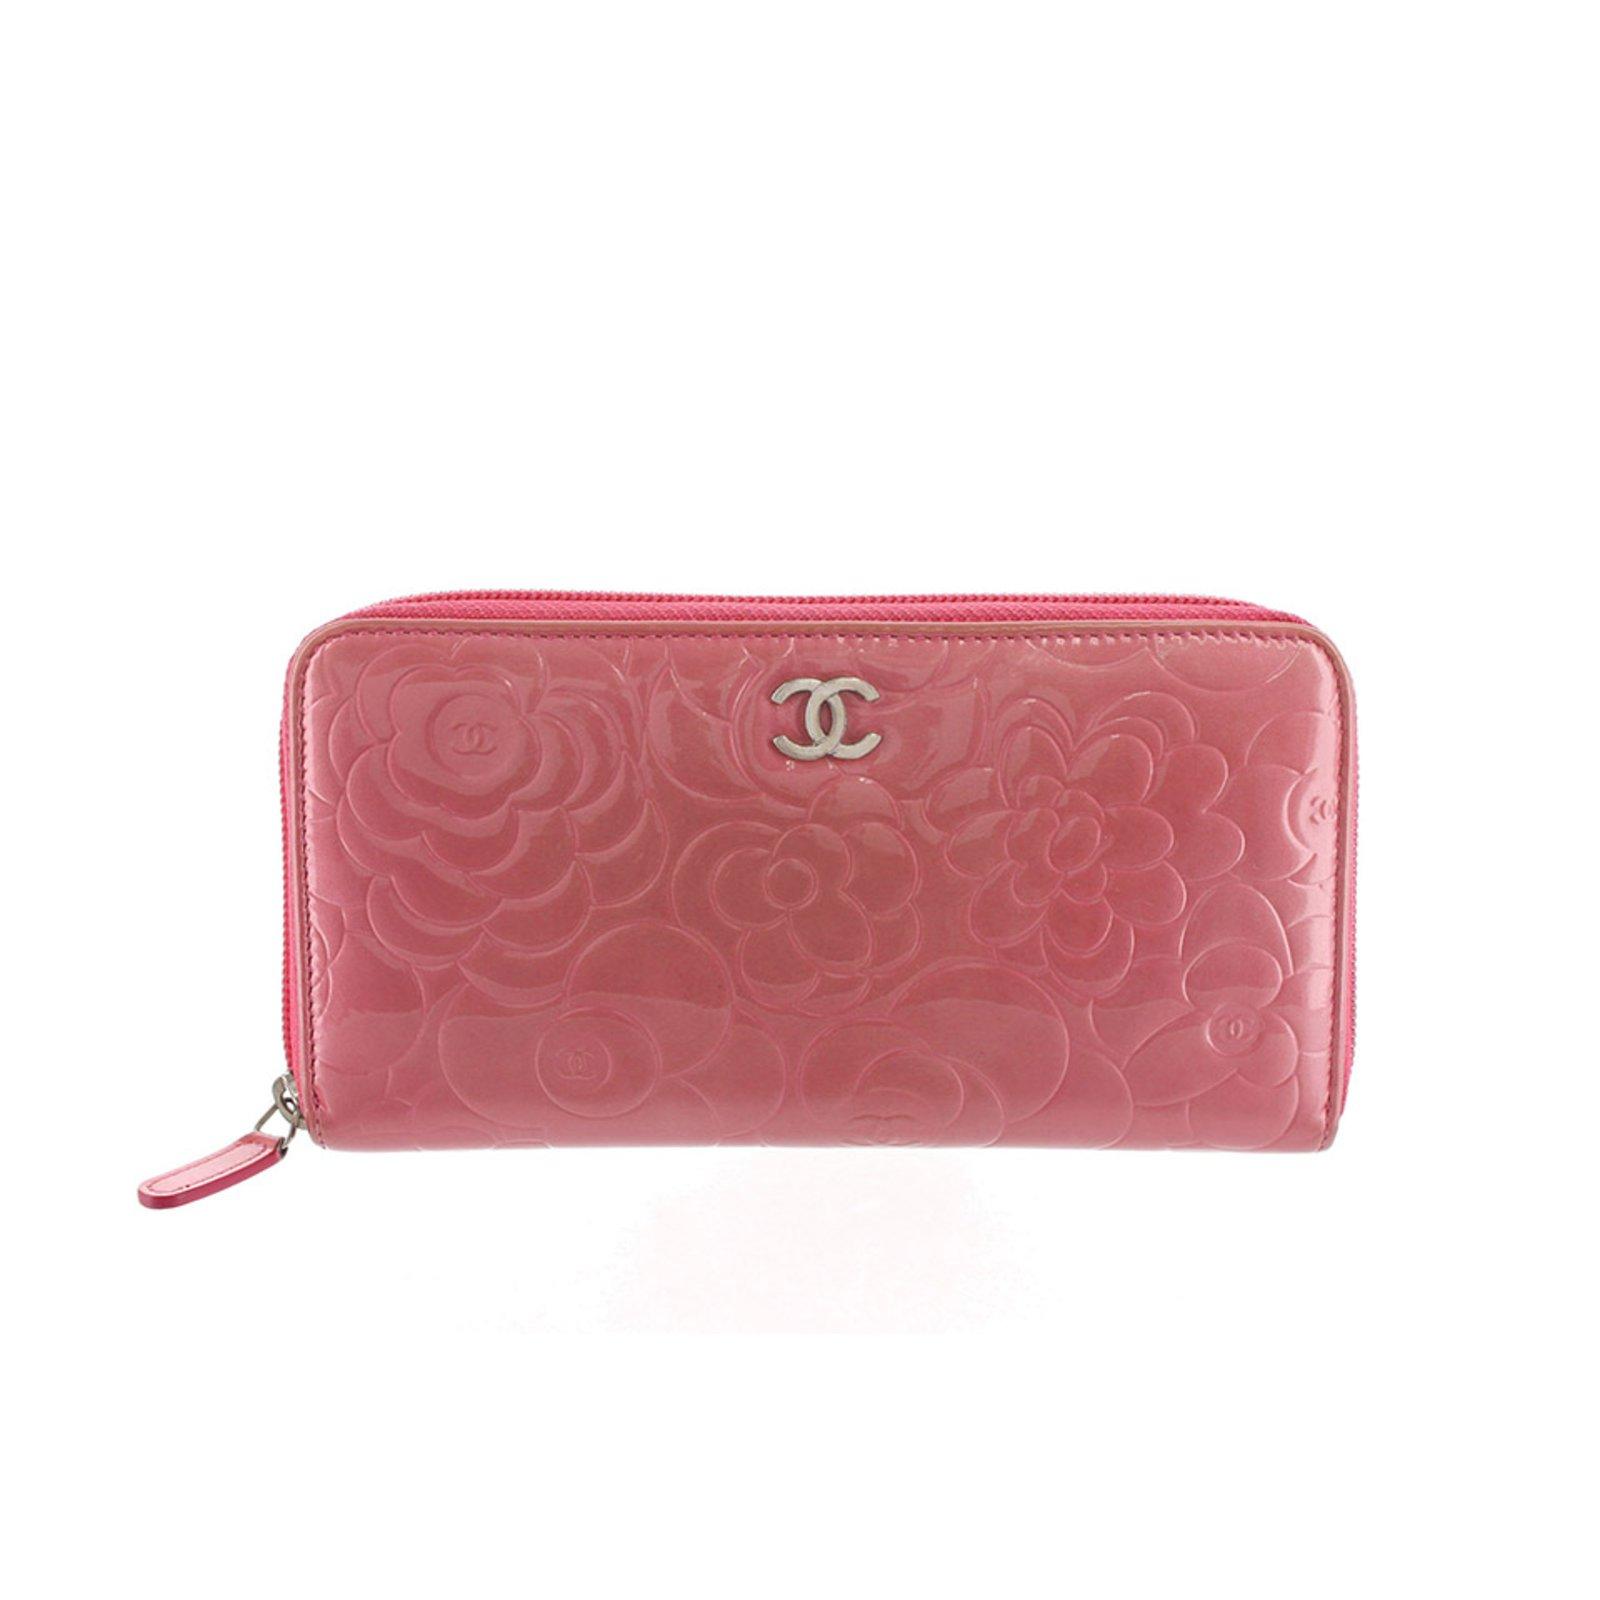 Petite maroquinerie Chanel Portefeuille en cuir verni camélia Cuir,Cuir  vernis Rose ref.89199 cdb1d63686d